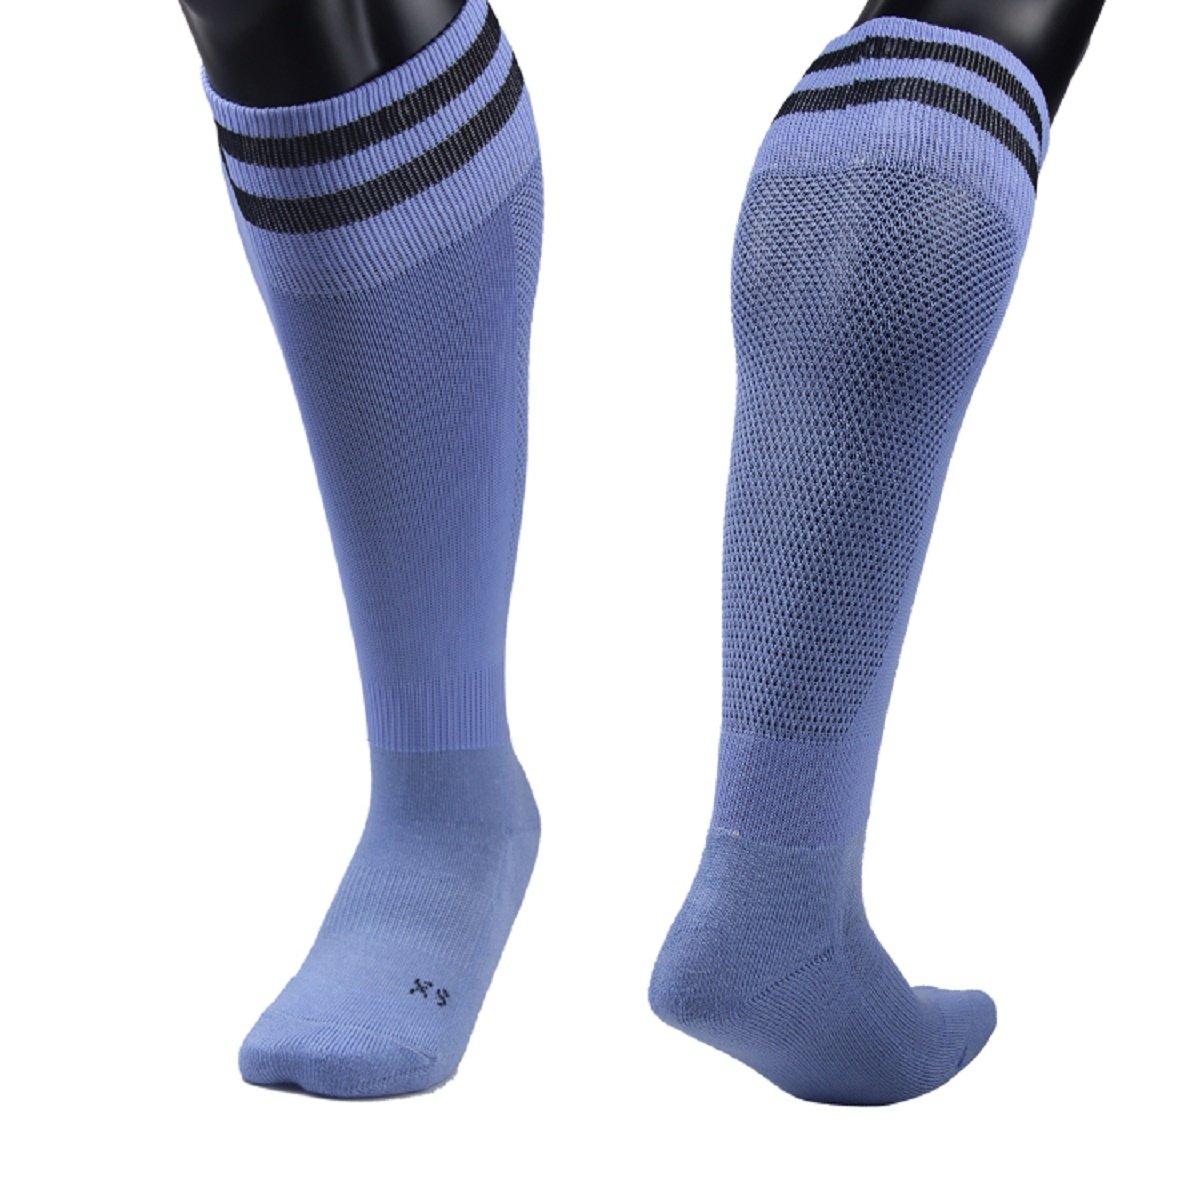 Lian LifeStyle Girl's 1 Pair Knee Length Sports Athletics Socks Striped 003 XXS/XS/S/M